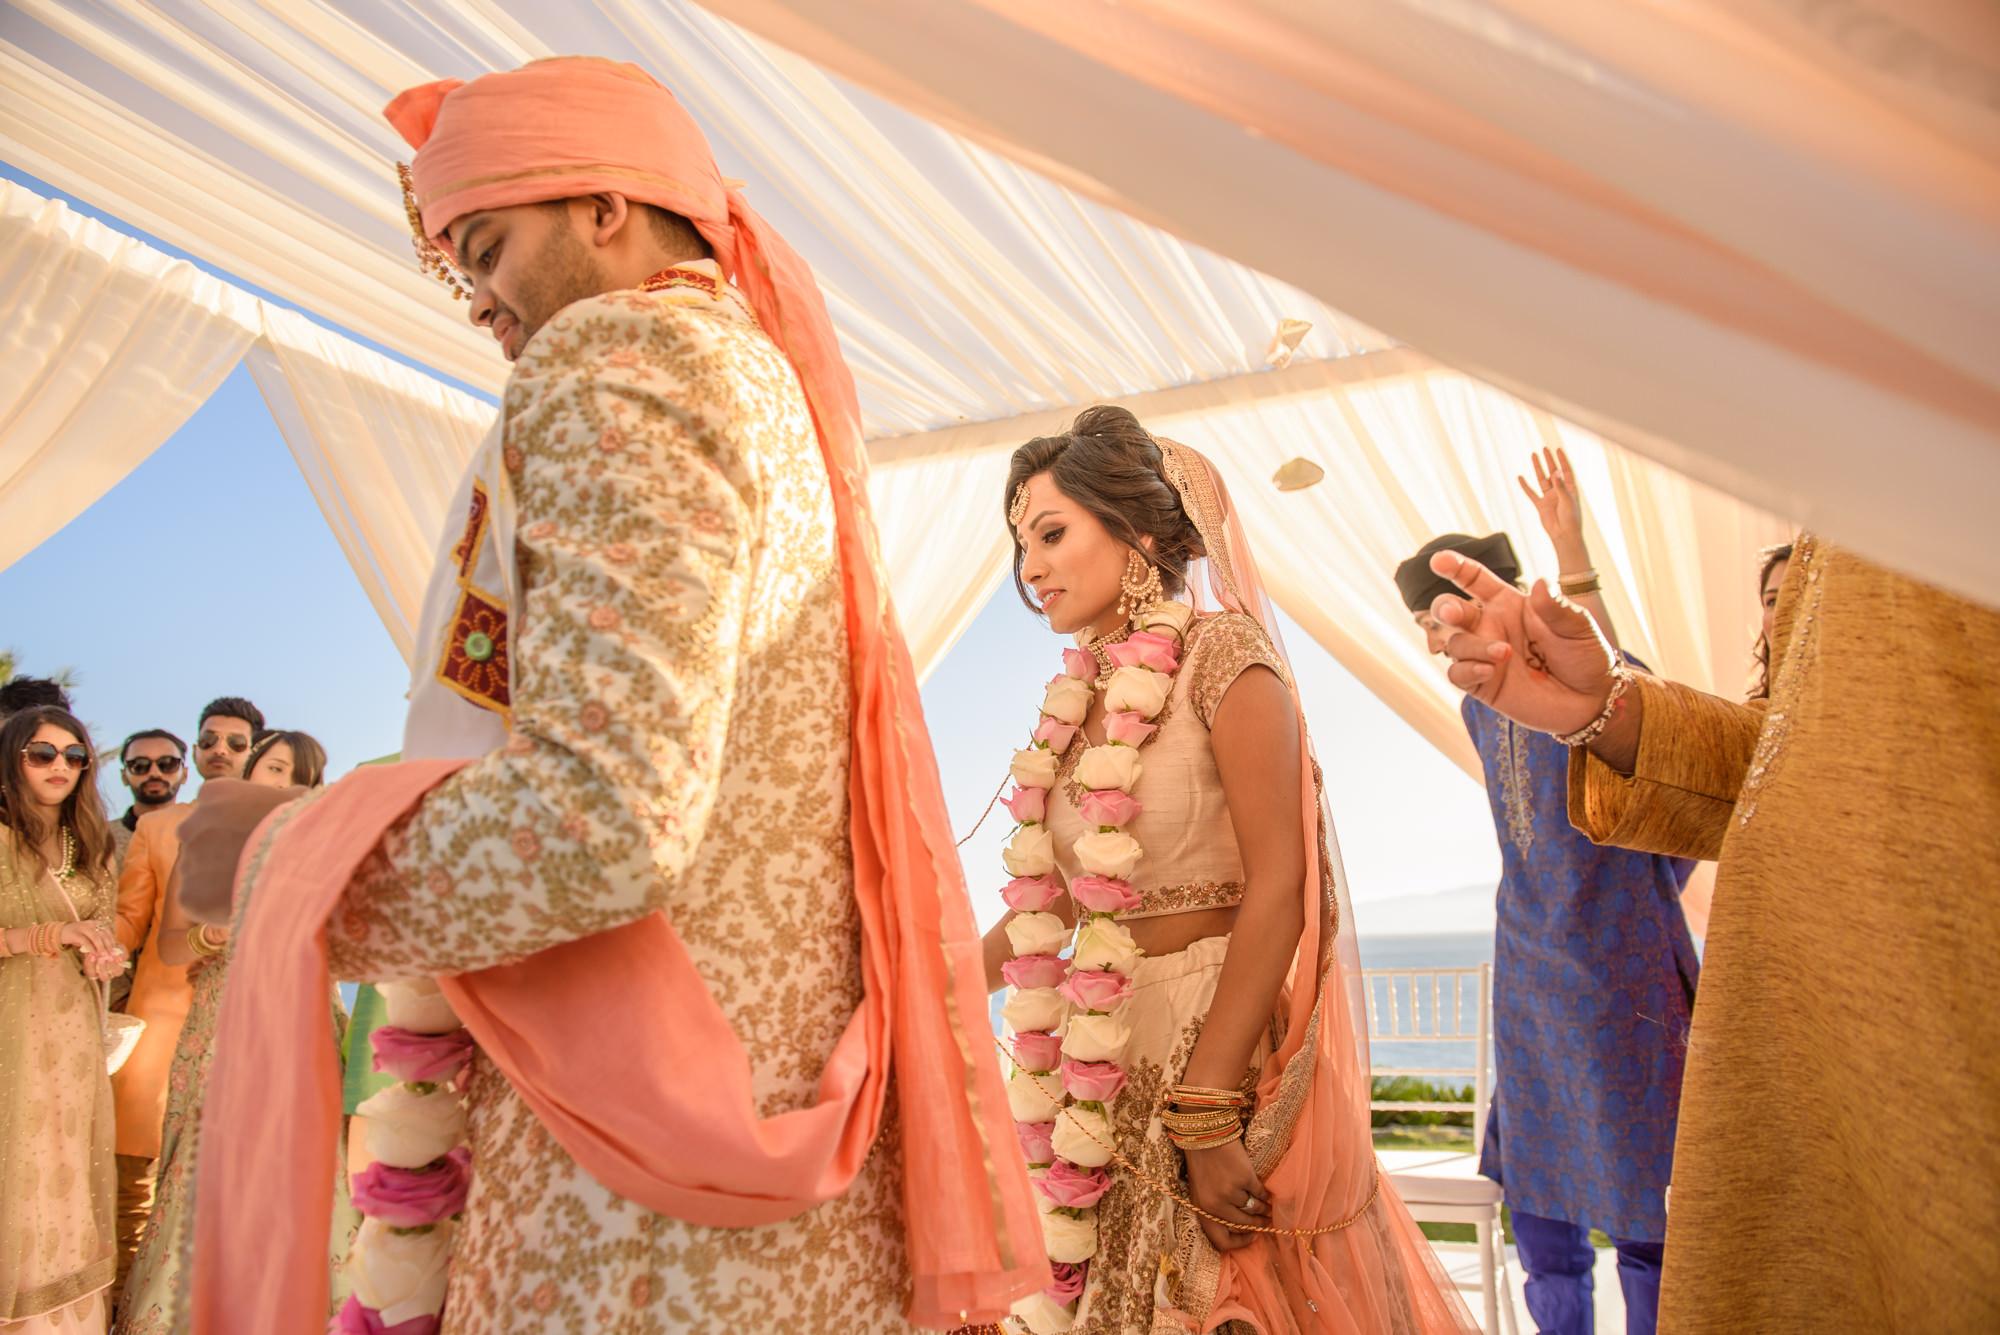 satnam photography wedding indian asian hindu destination wedding photographer tenerife ritz carlton abama-186.jpg